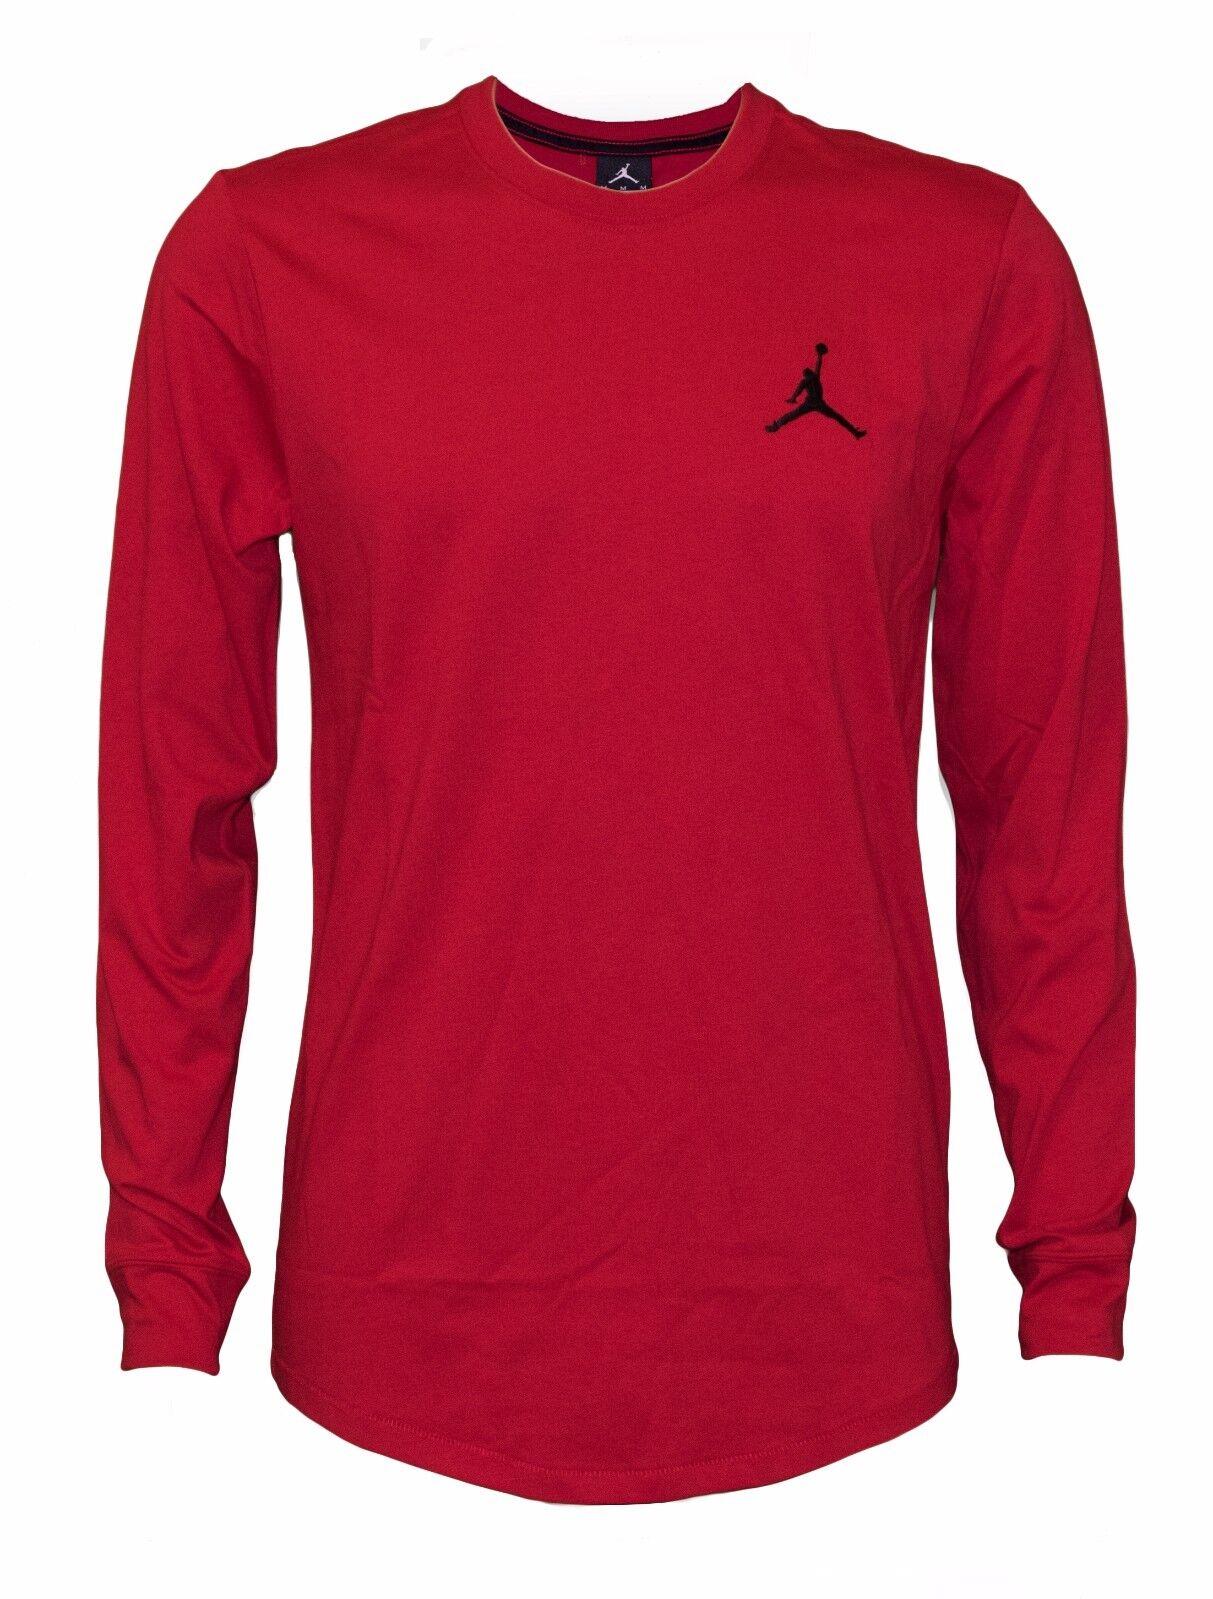 2e8e84ec364e Nike Men s Air Jordan Embroidered Jumpman Shooting Long Sleeve Red T-Shirt